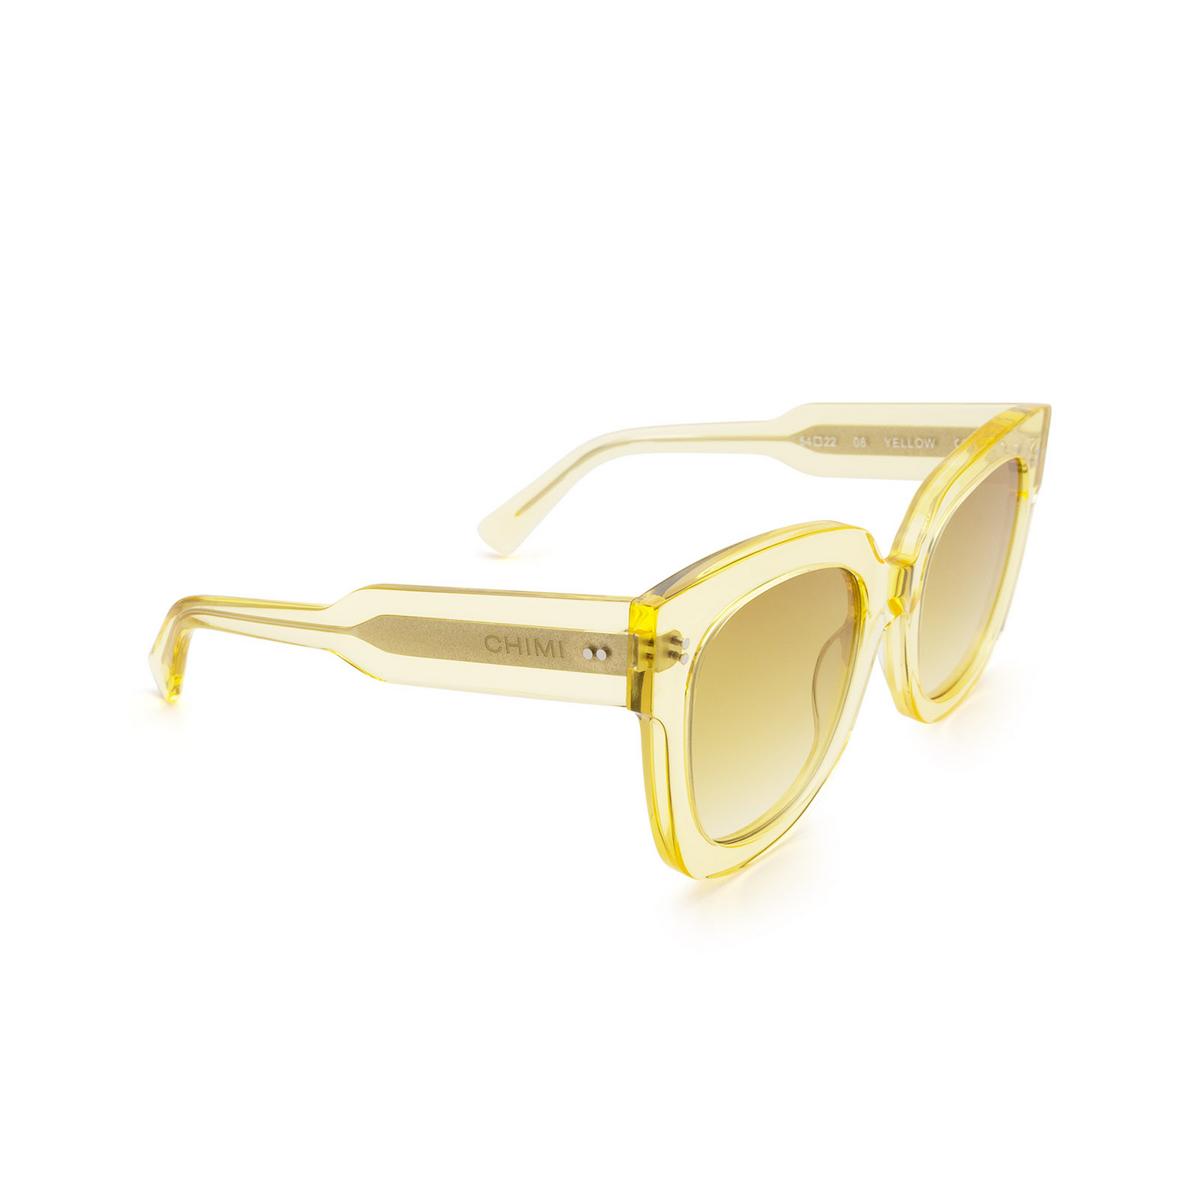 Chimi® Square Sunglasses: 08 color Yellow - three-quarters view.